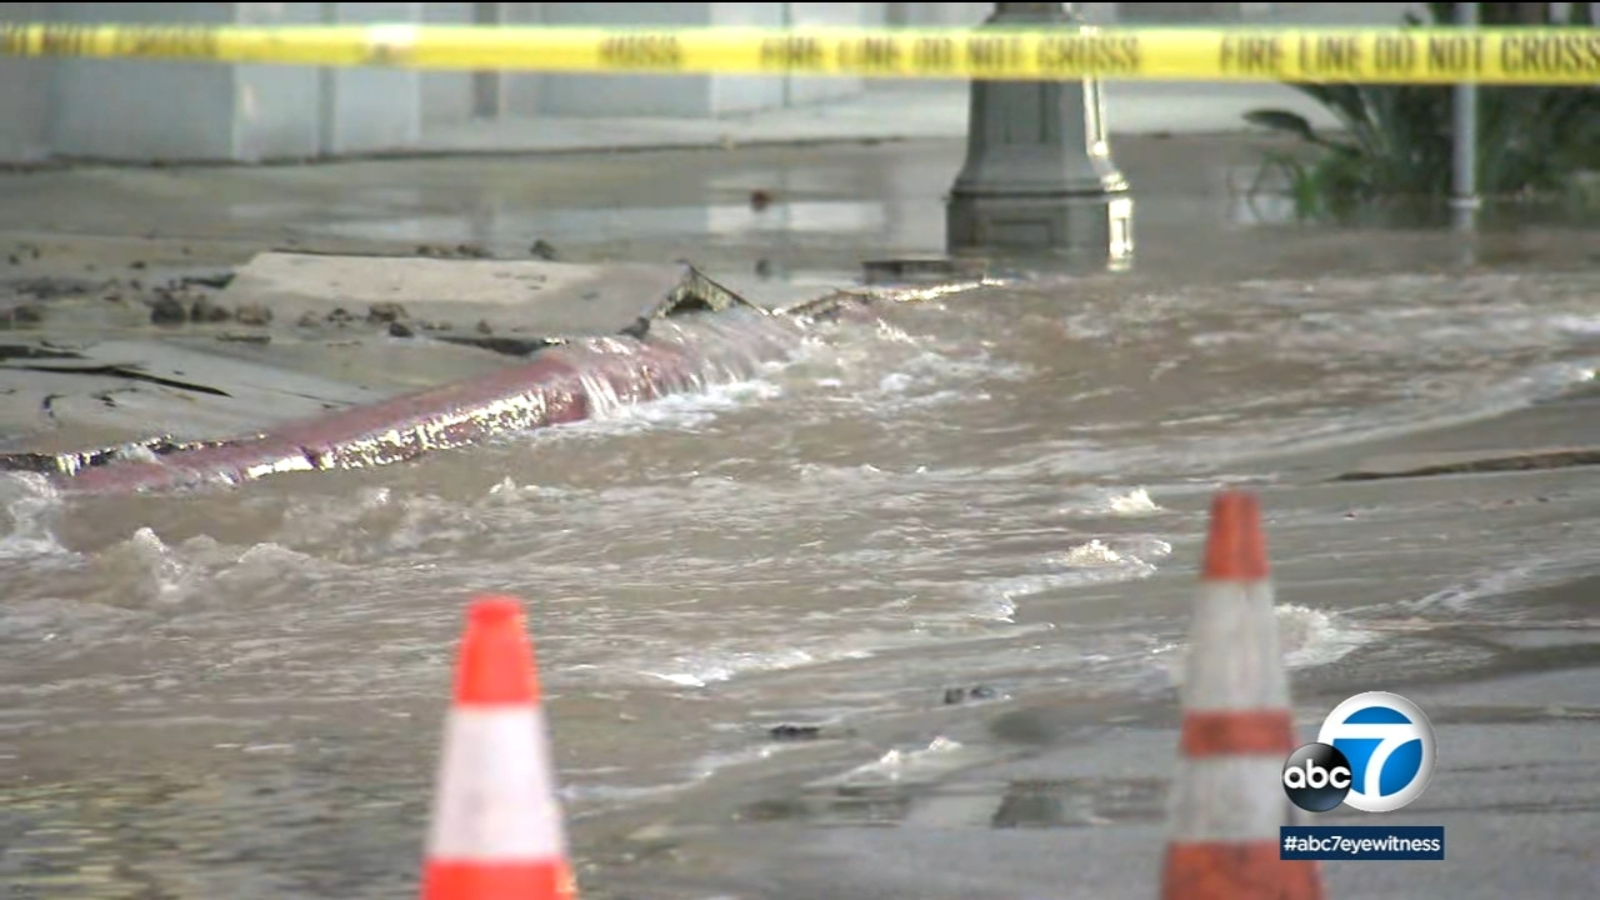 Major water main break flooding streets in downtown Los Angeles